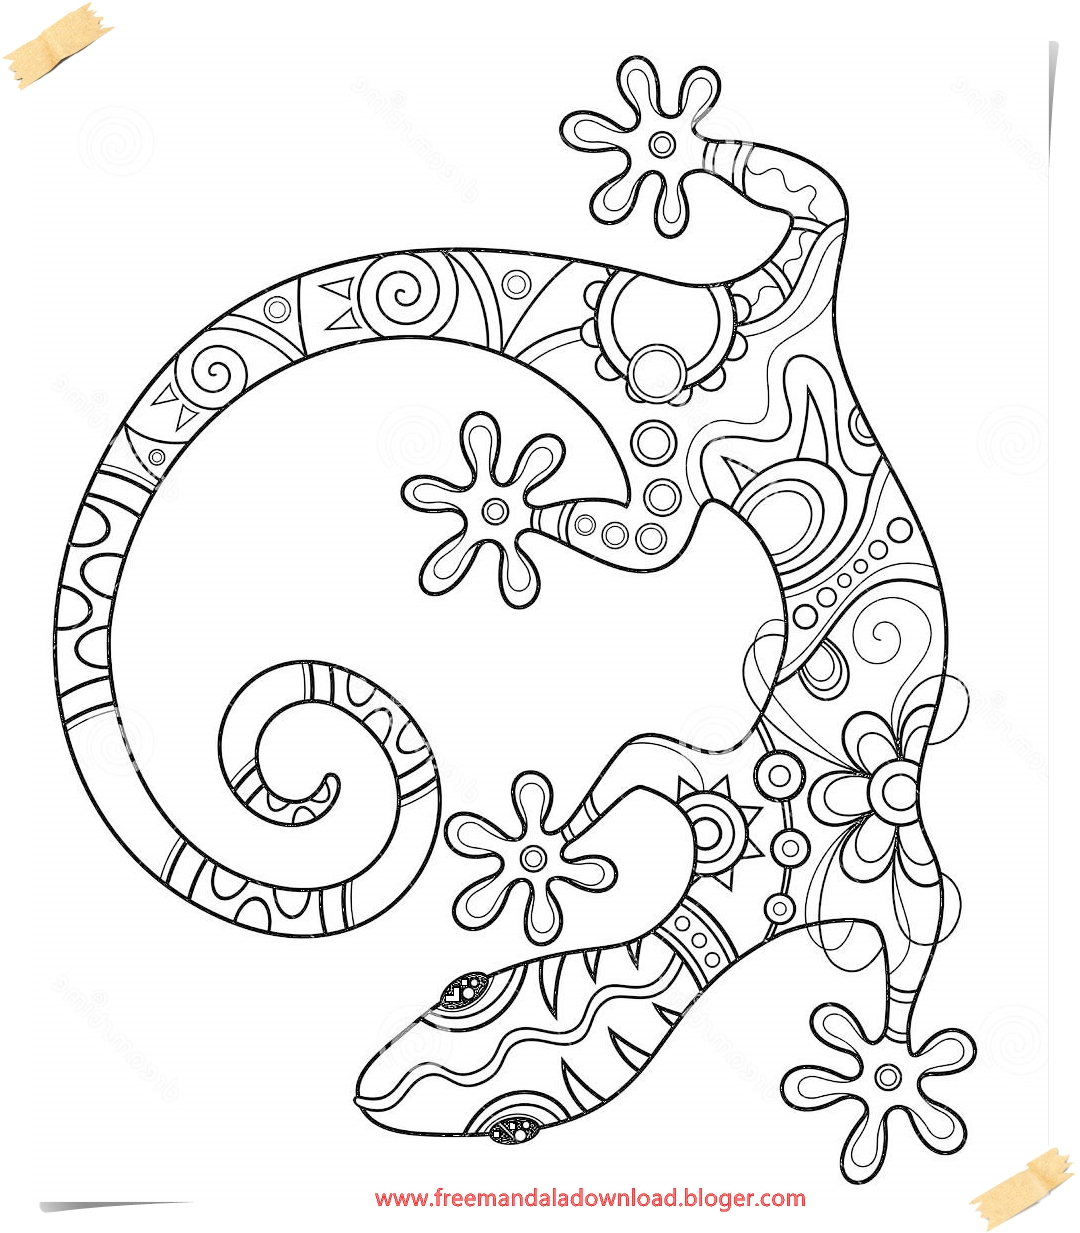 Lizard Mandala Malvorlagen-Lizard Mandala coloring page